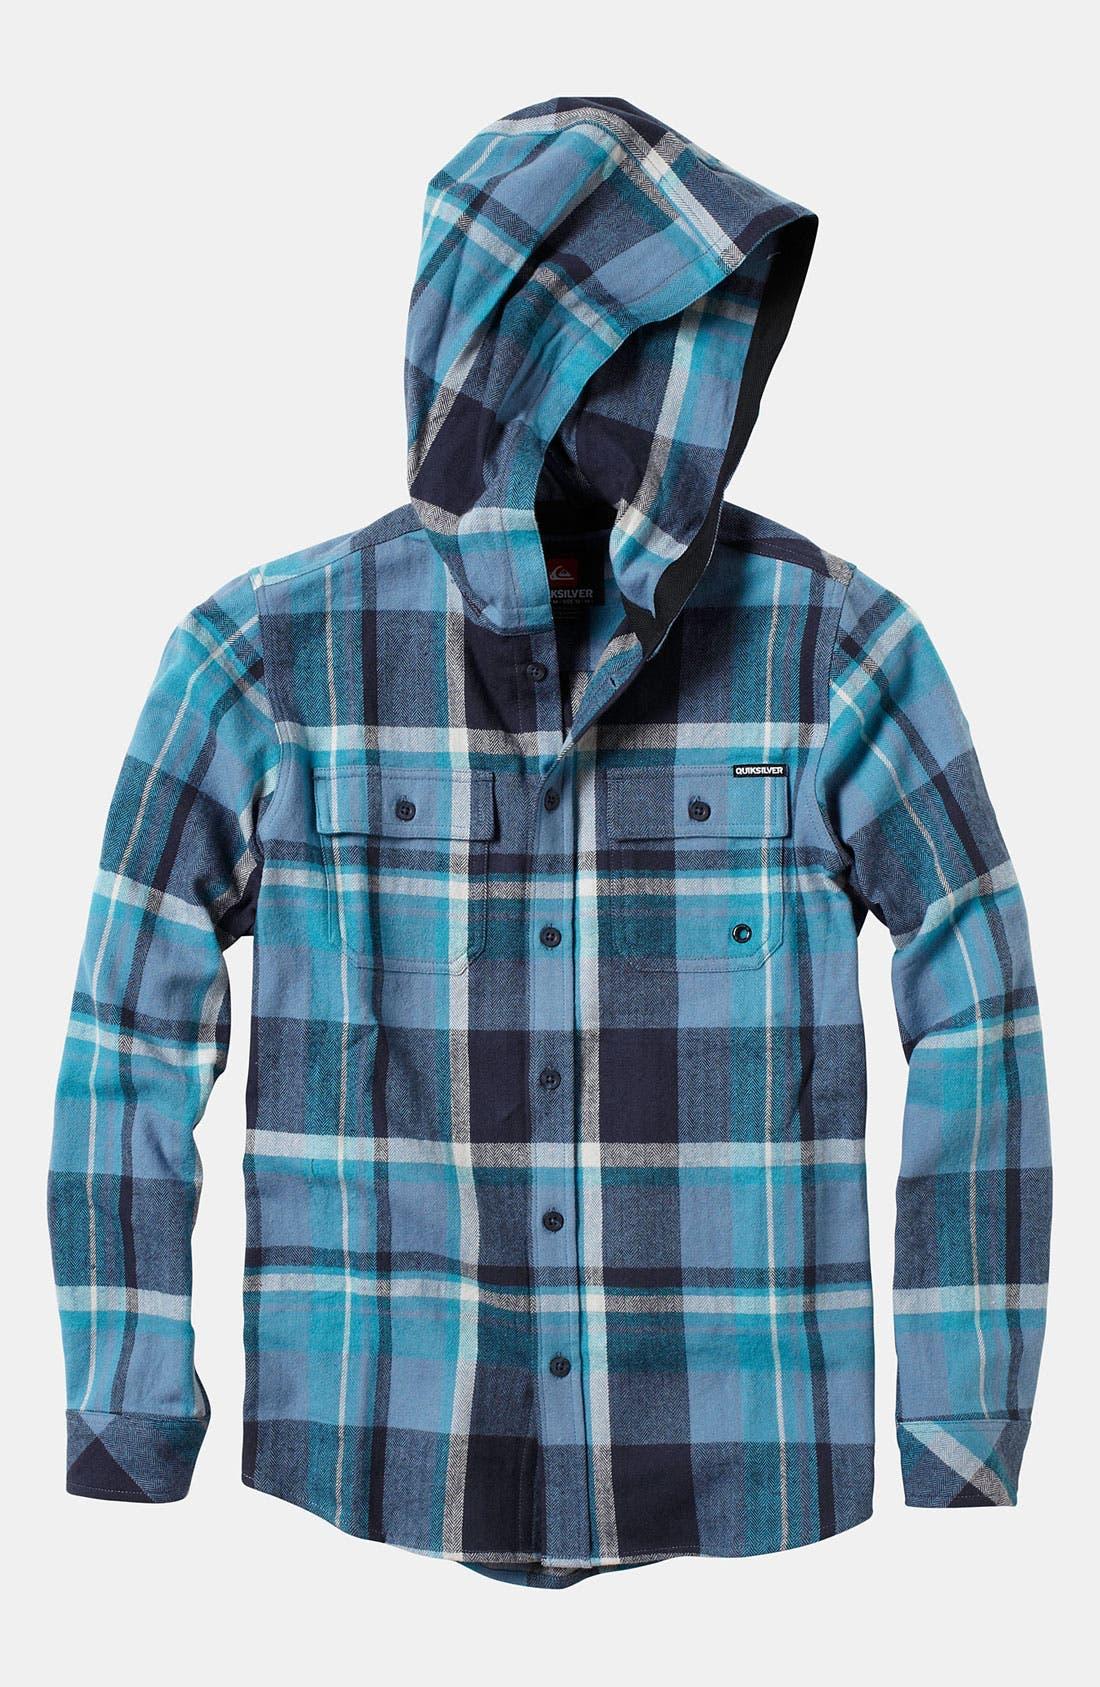 Main Image - Quiksilver 'Four Shore' Hooded Flannel Shirt (Little Boys)